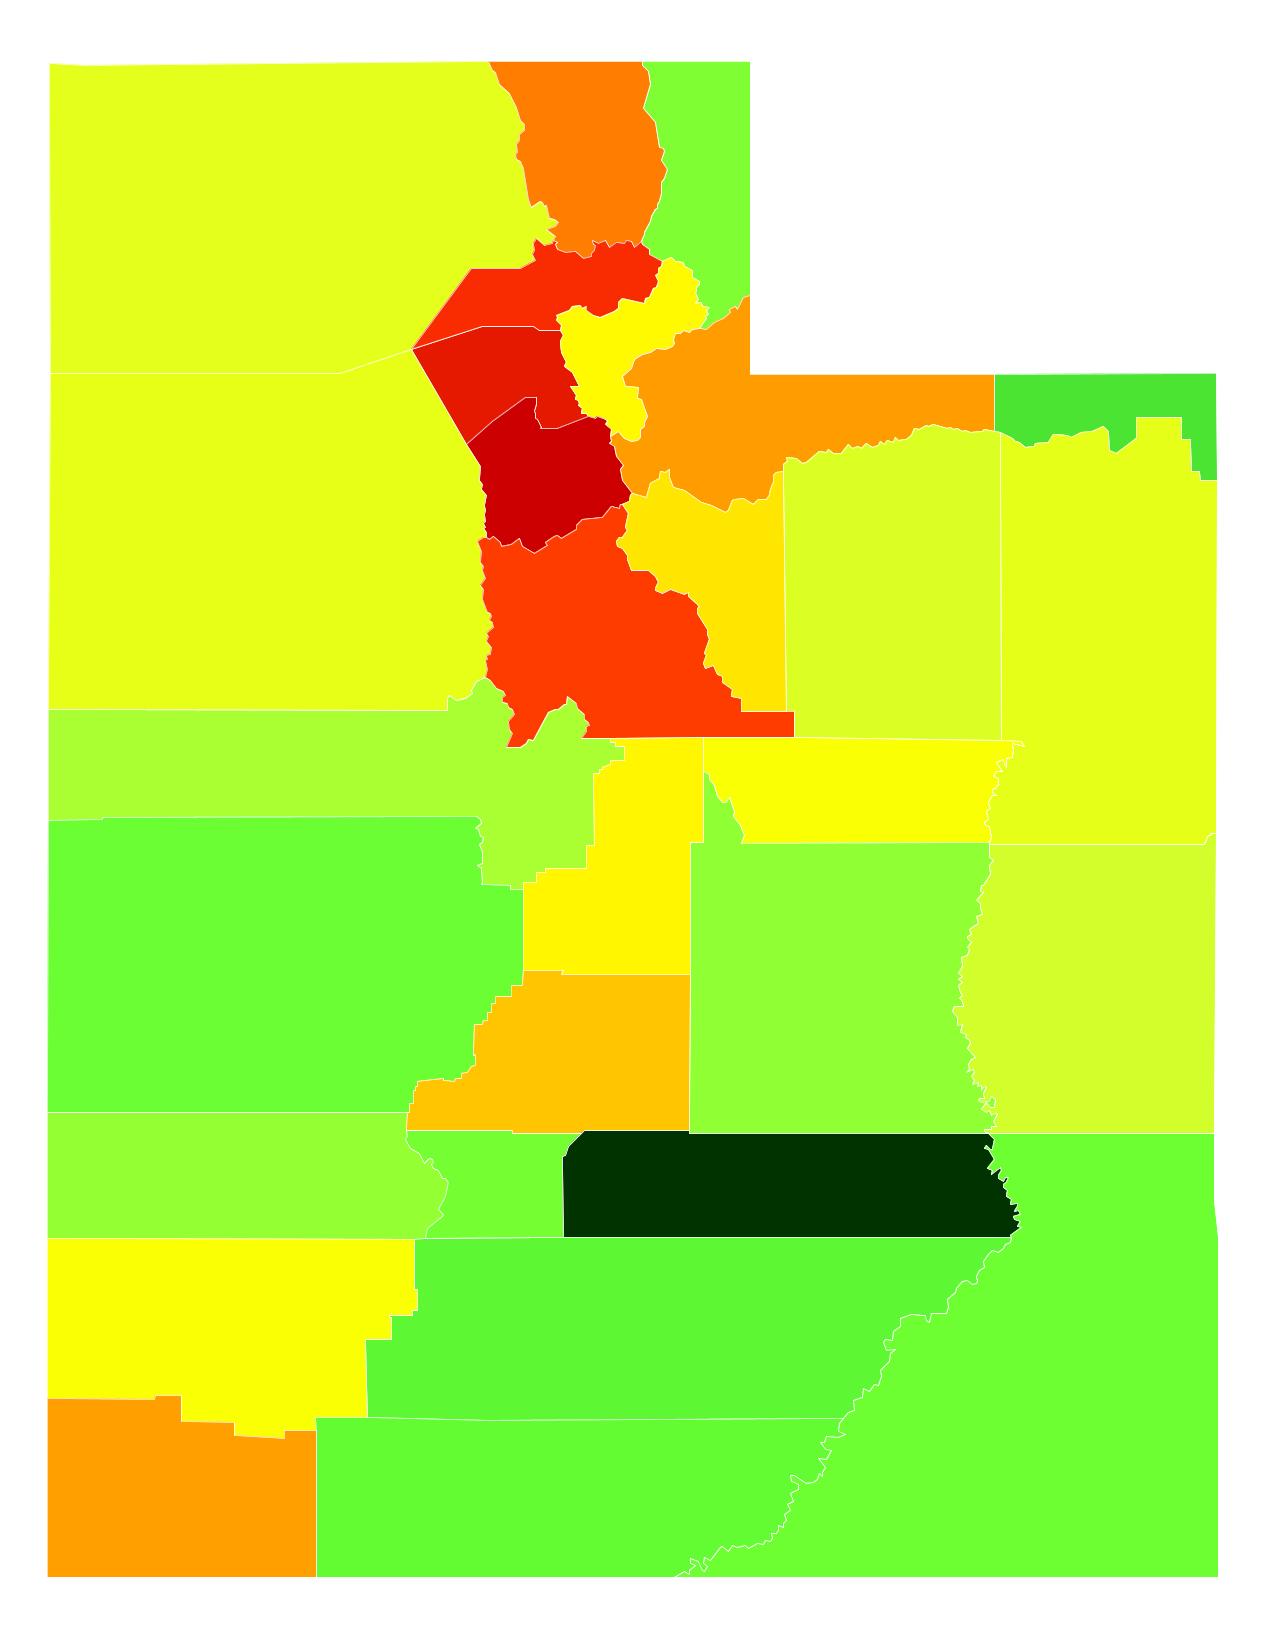 Utah Population Density - AtlasBig.com